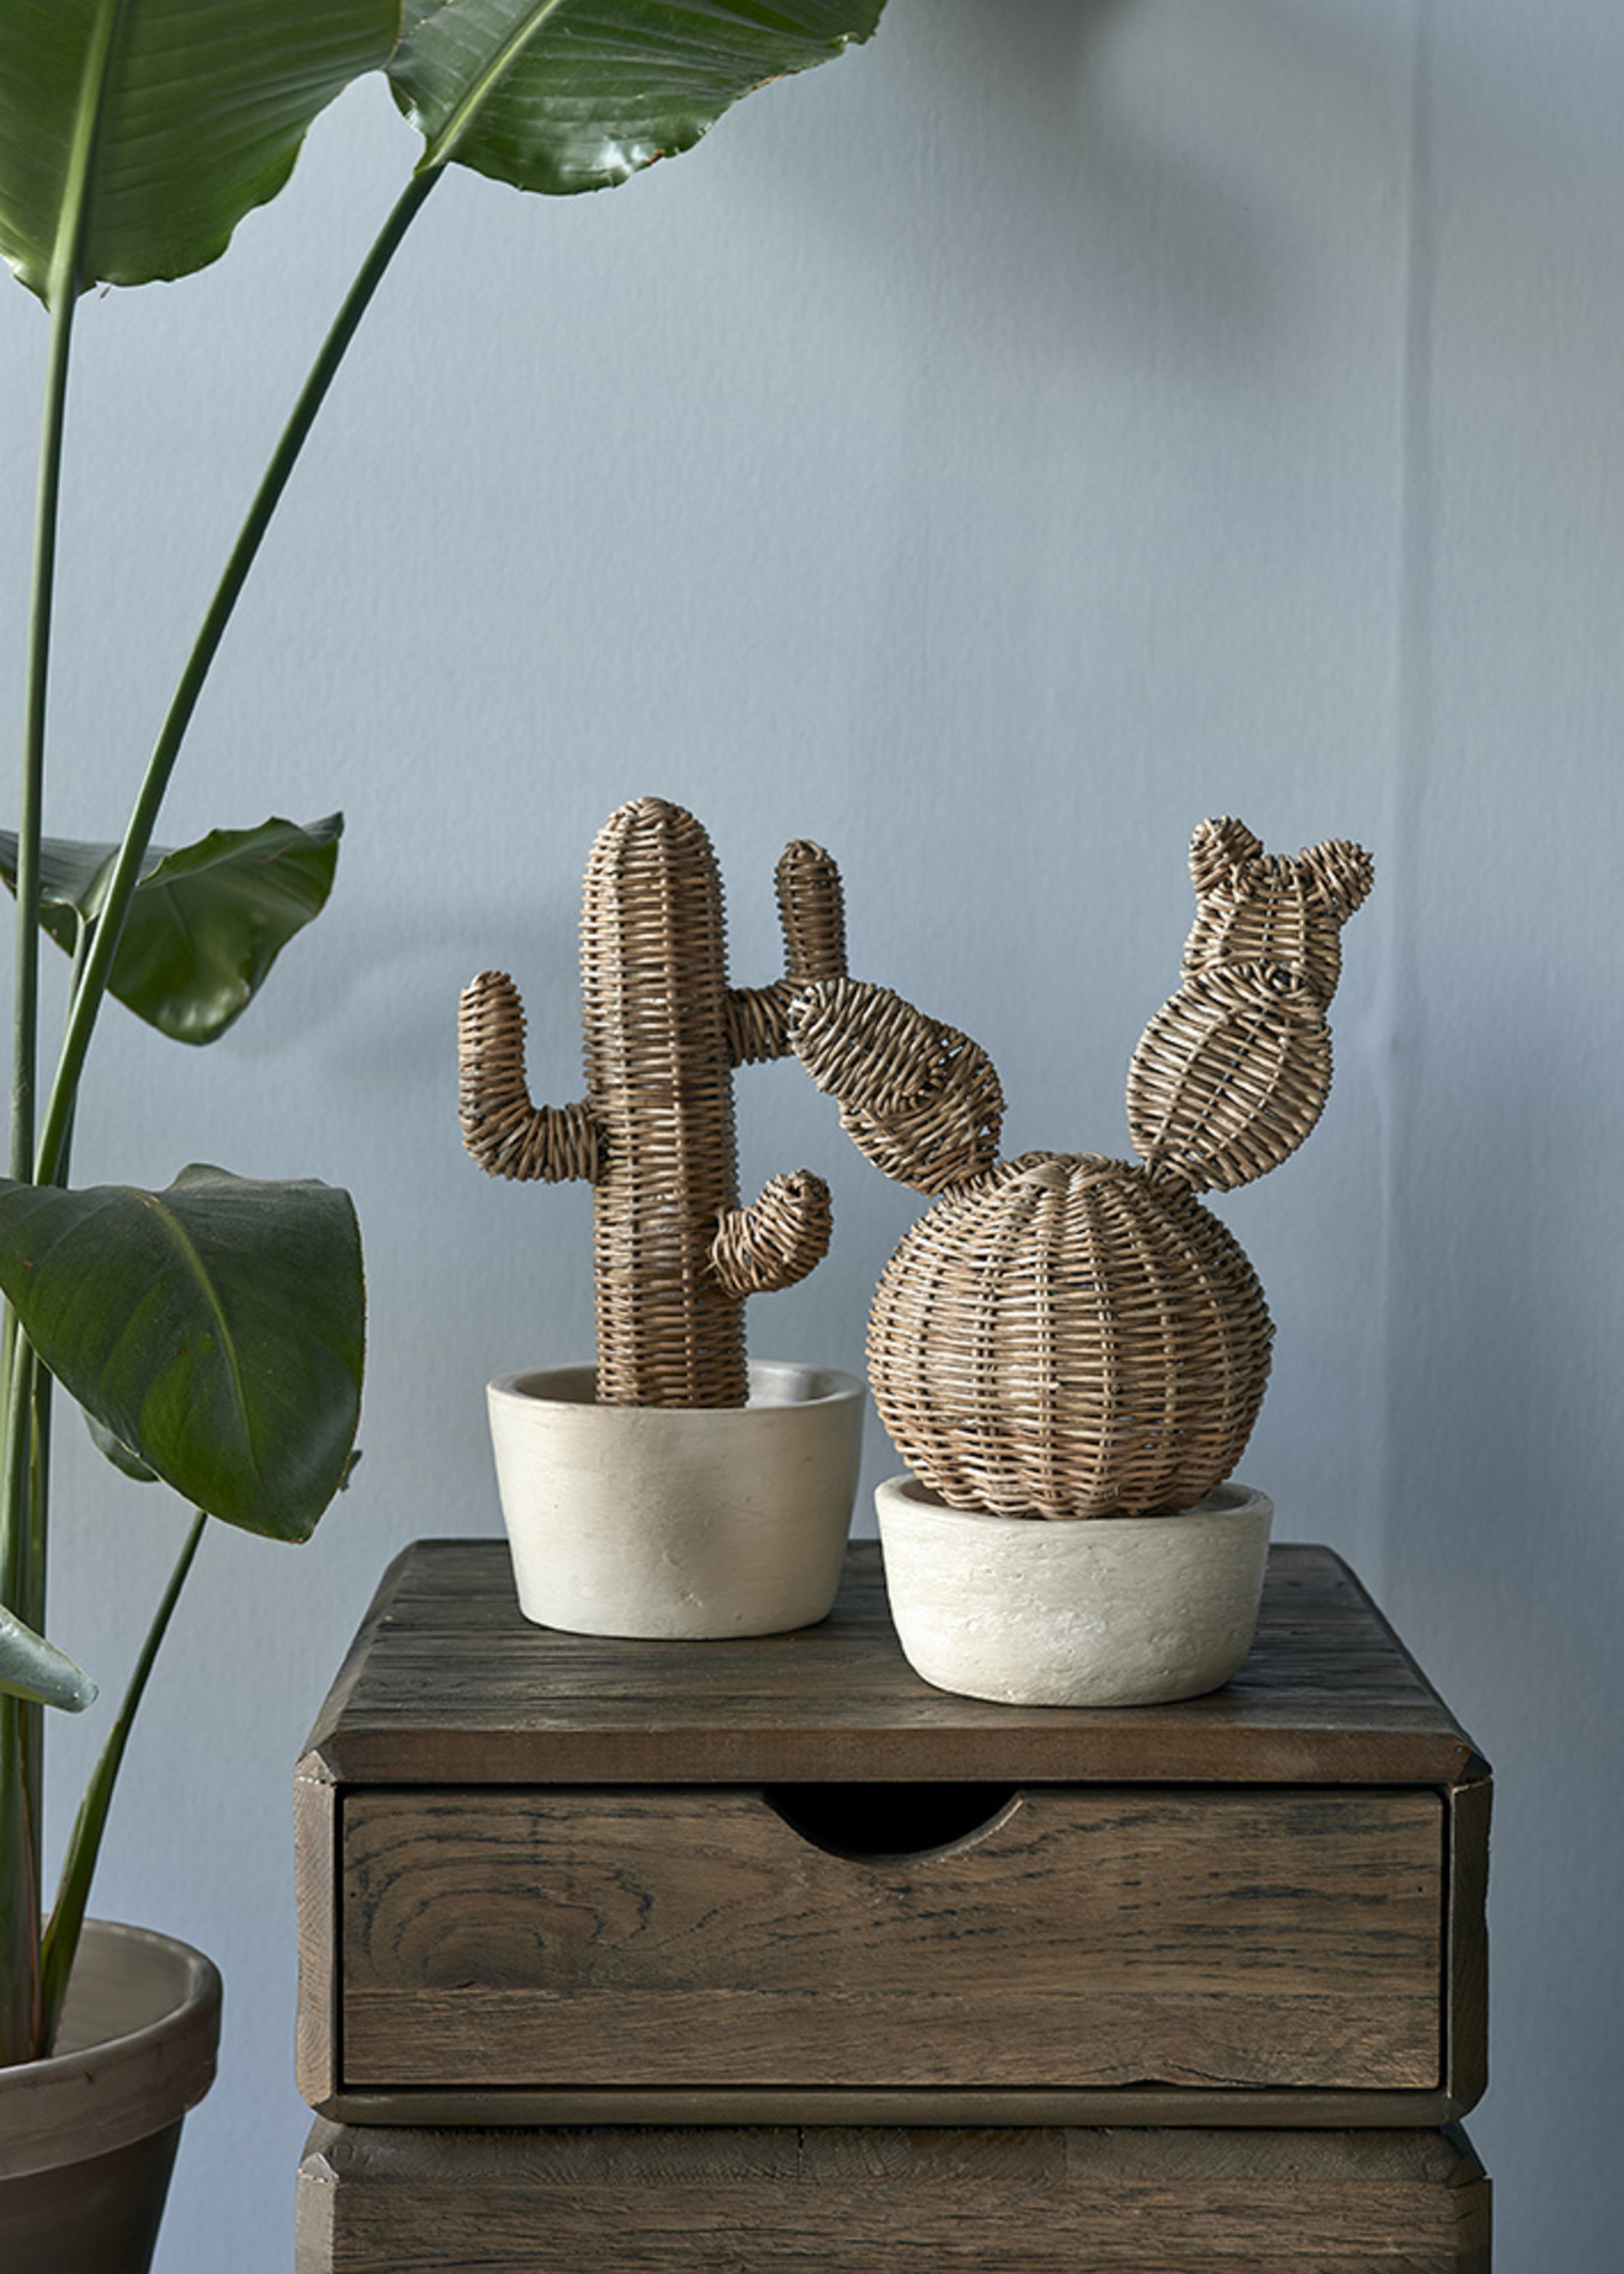 Riviera Maison Rustic Rattan Prickly Pear Cactus